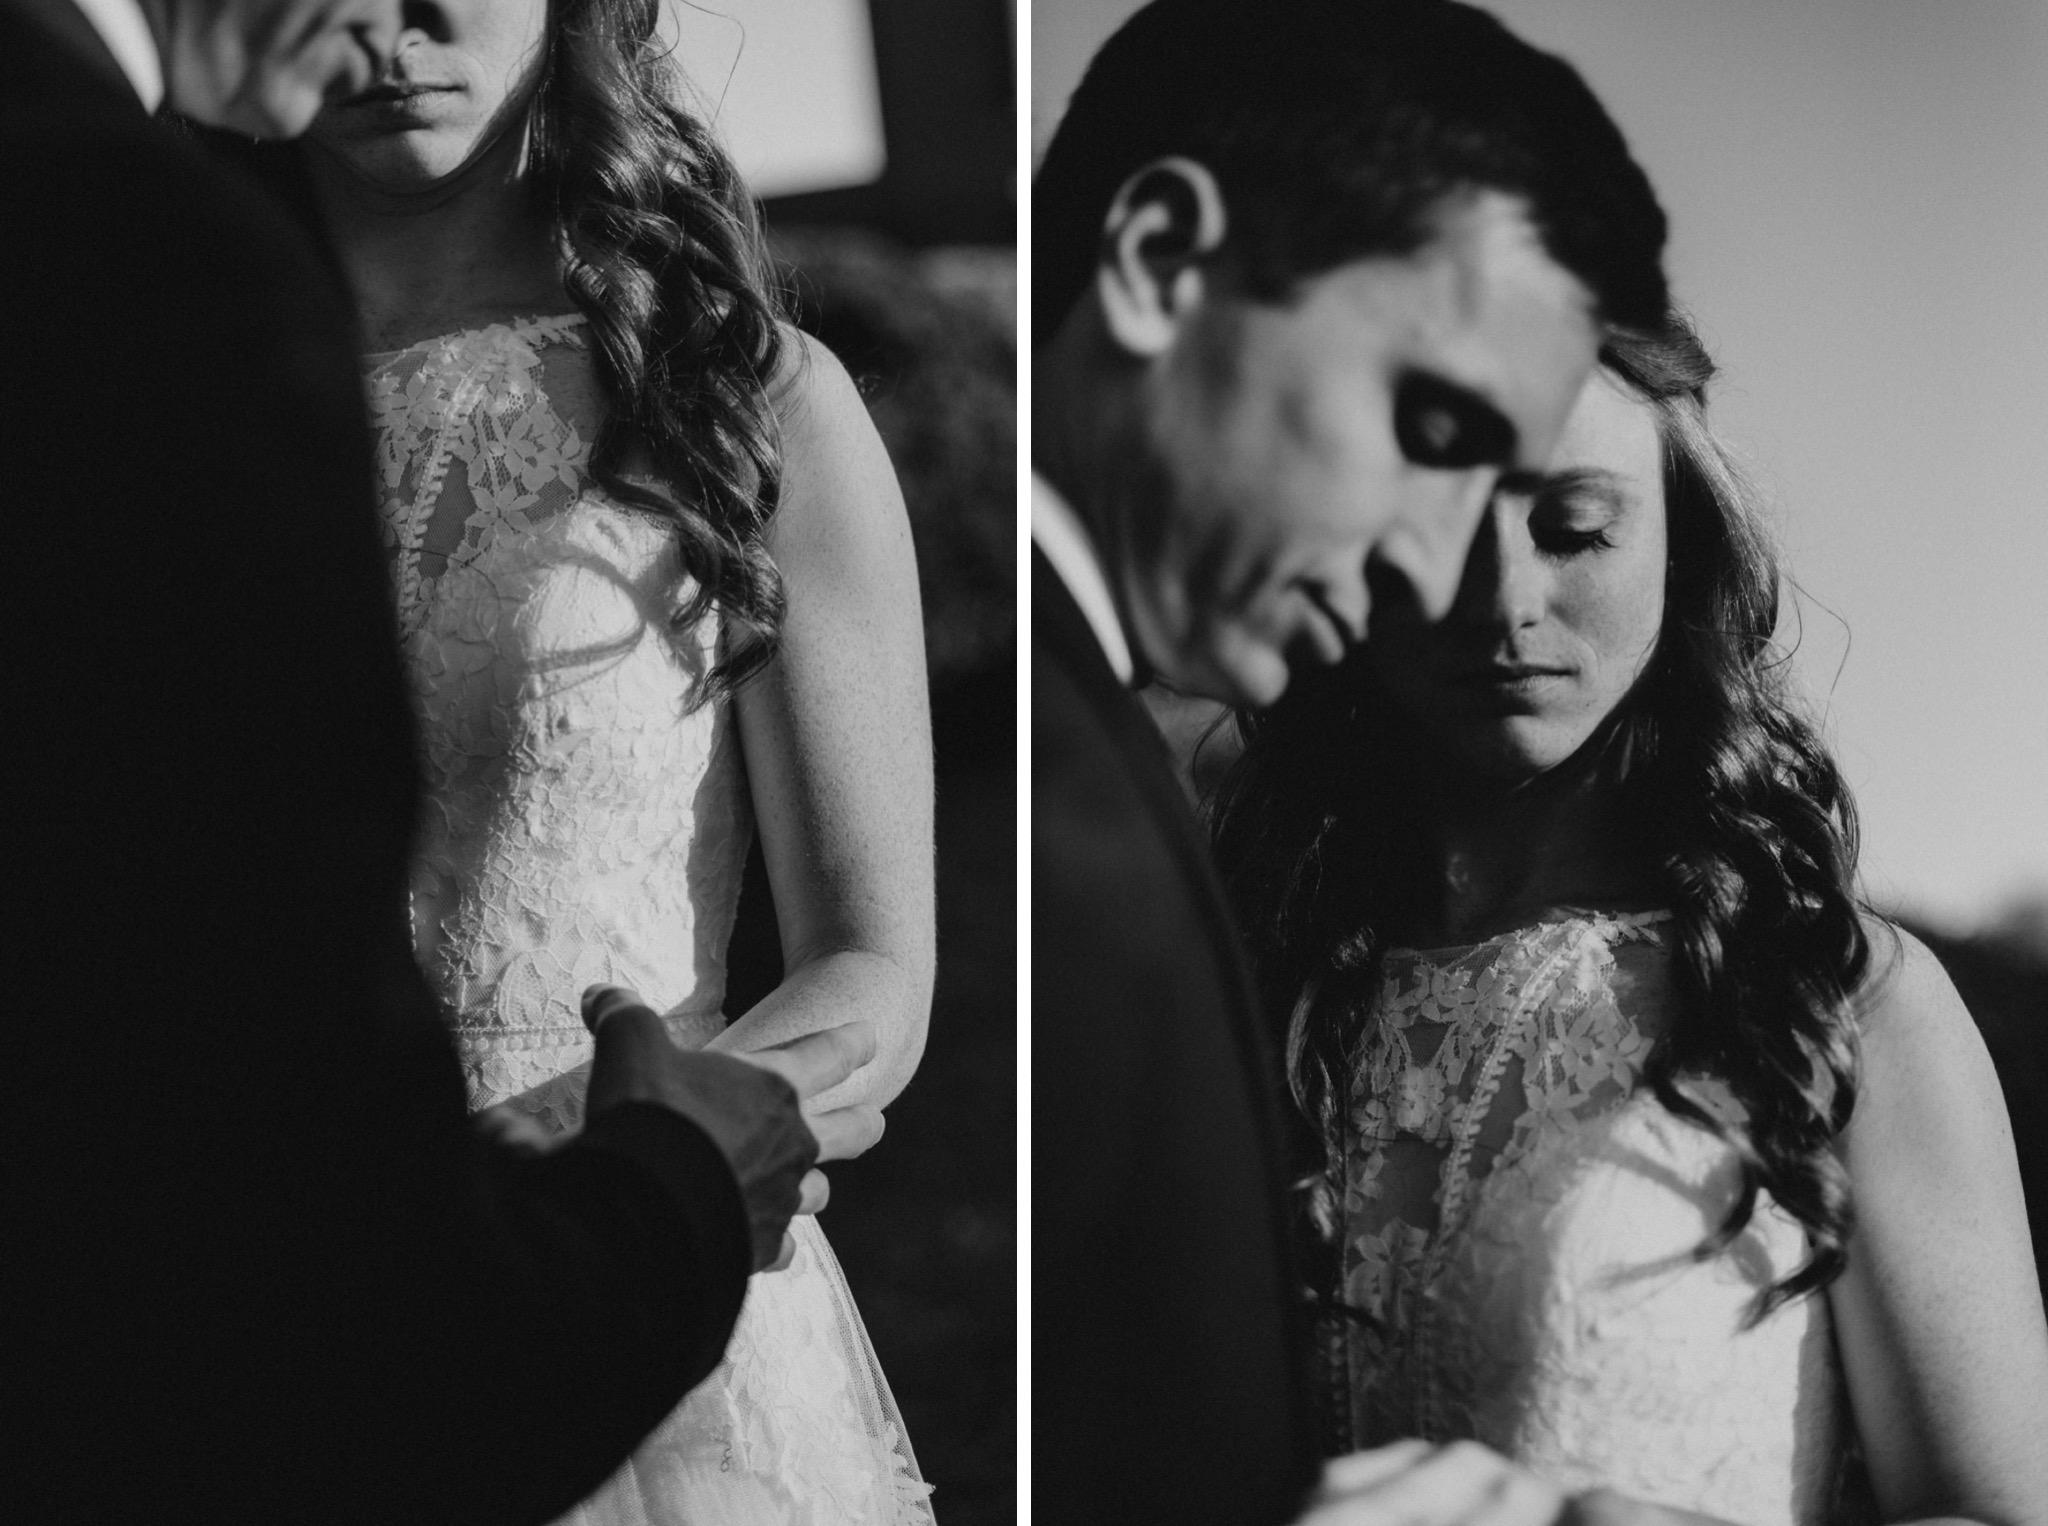 70_West Manor Estate Weddings - Pat Cori Photography-144_West Manor Estate Weddings - Pat Cori Photography-145_romantic_brideandgroom_WestManorEstate_Portraits_VirginiaWeddingPhotographer.jpg